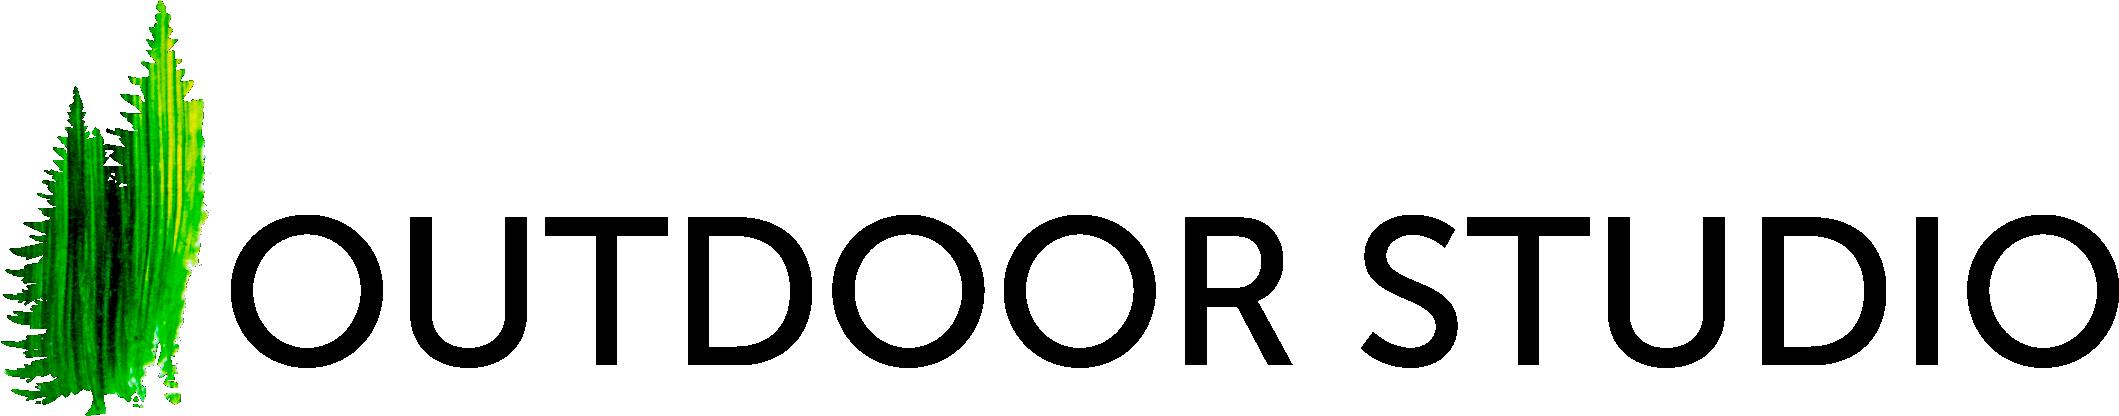 outdoor-studio-logo-colour-rgb